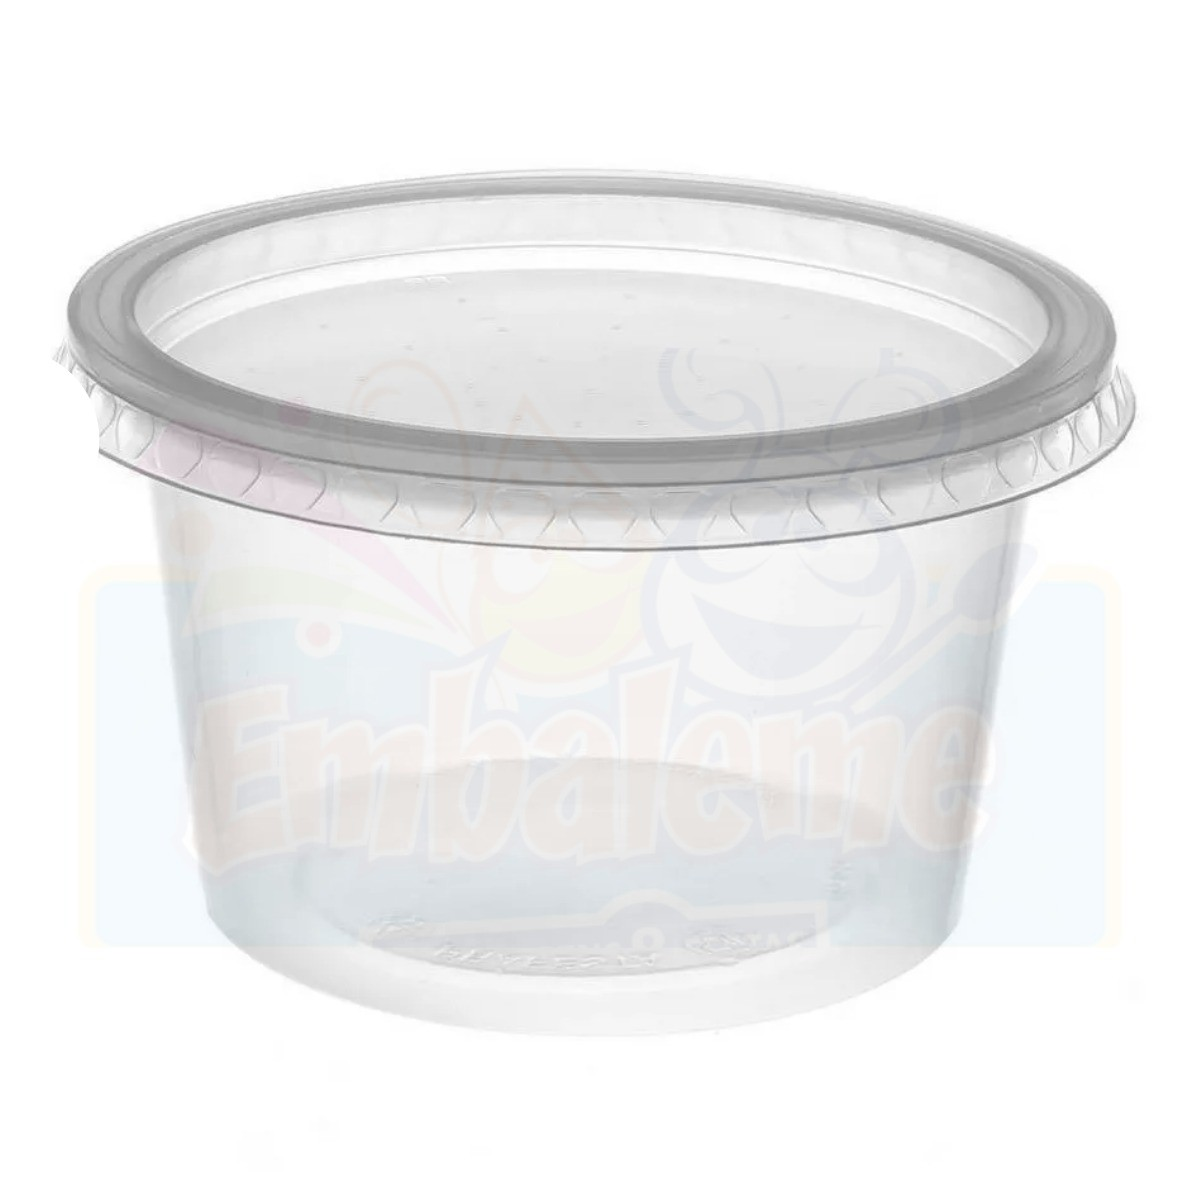 Pote Redondo 250ml Para Microondas E Freezer C/50 Rioplastic